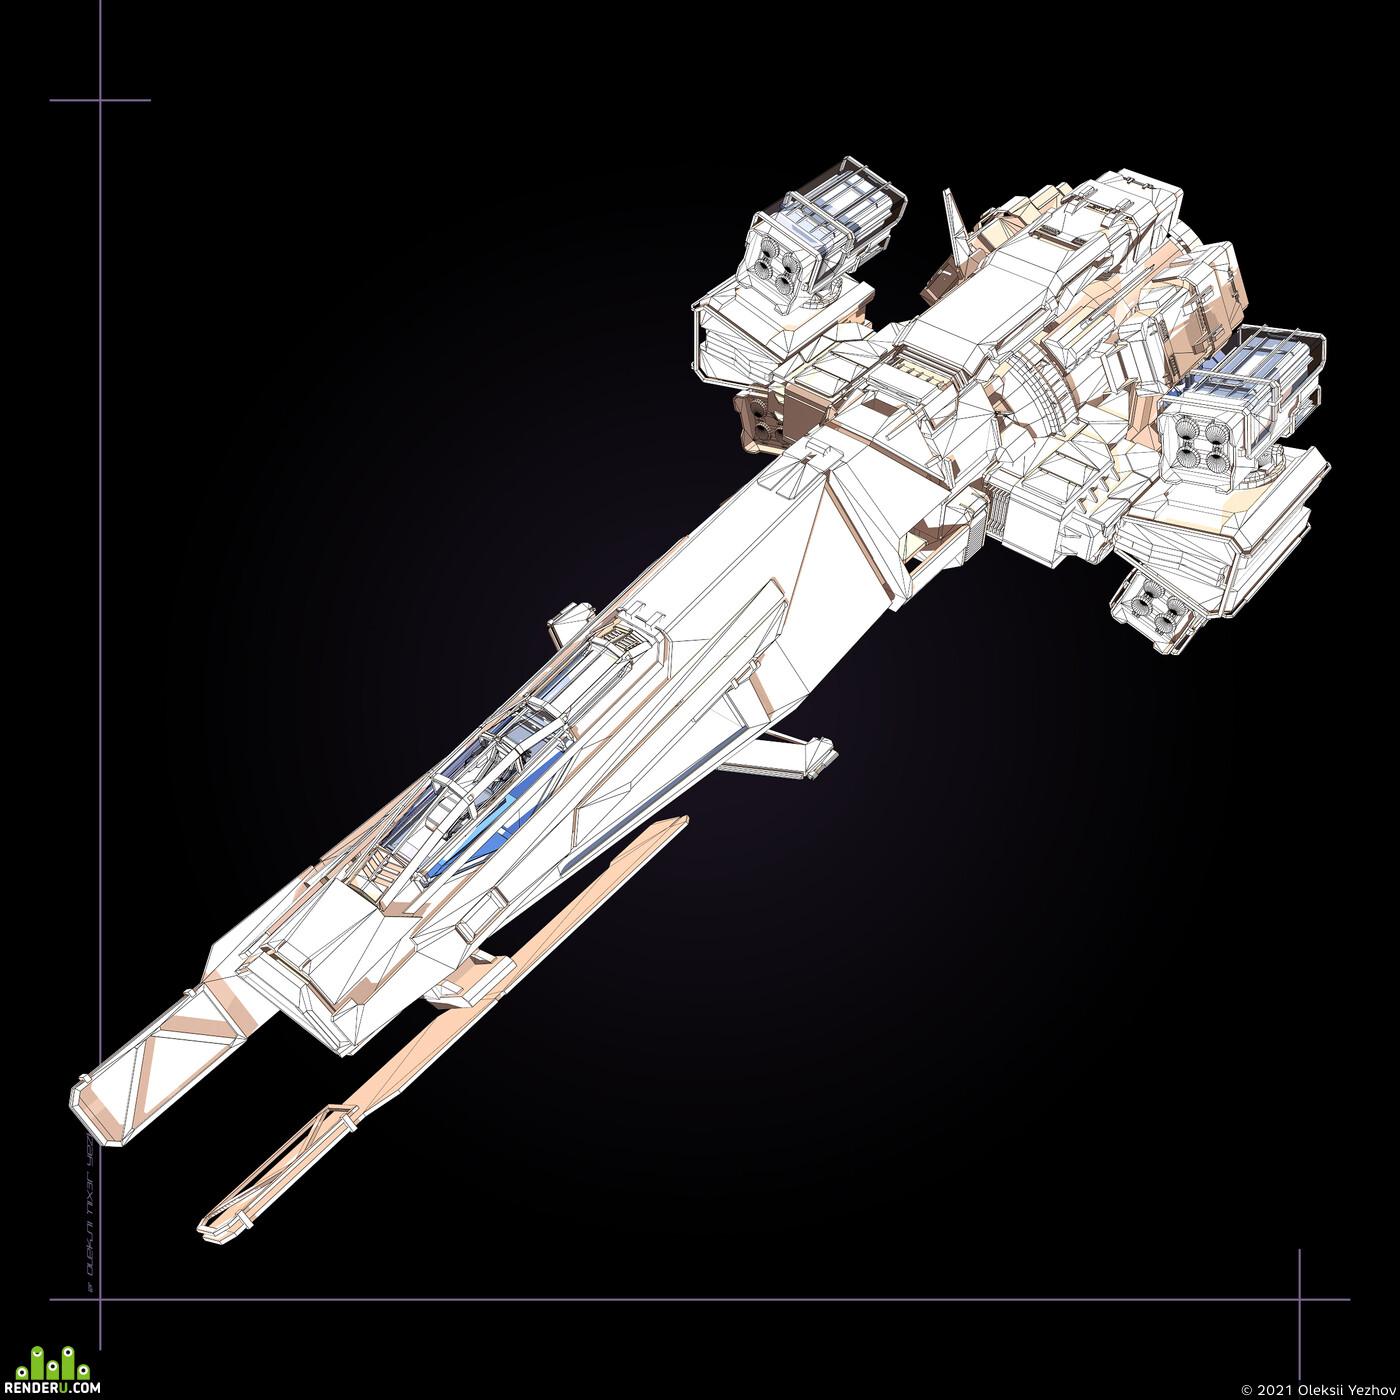 Digital 3D, Game Art, ST-5, Typhoon, Bomber, Spaceship, vechicle